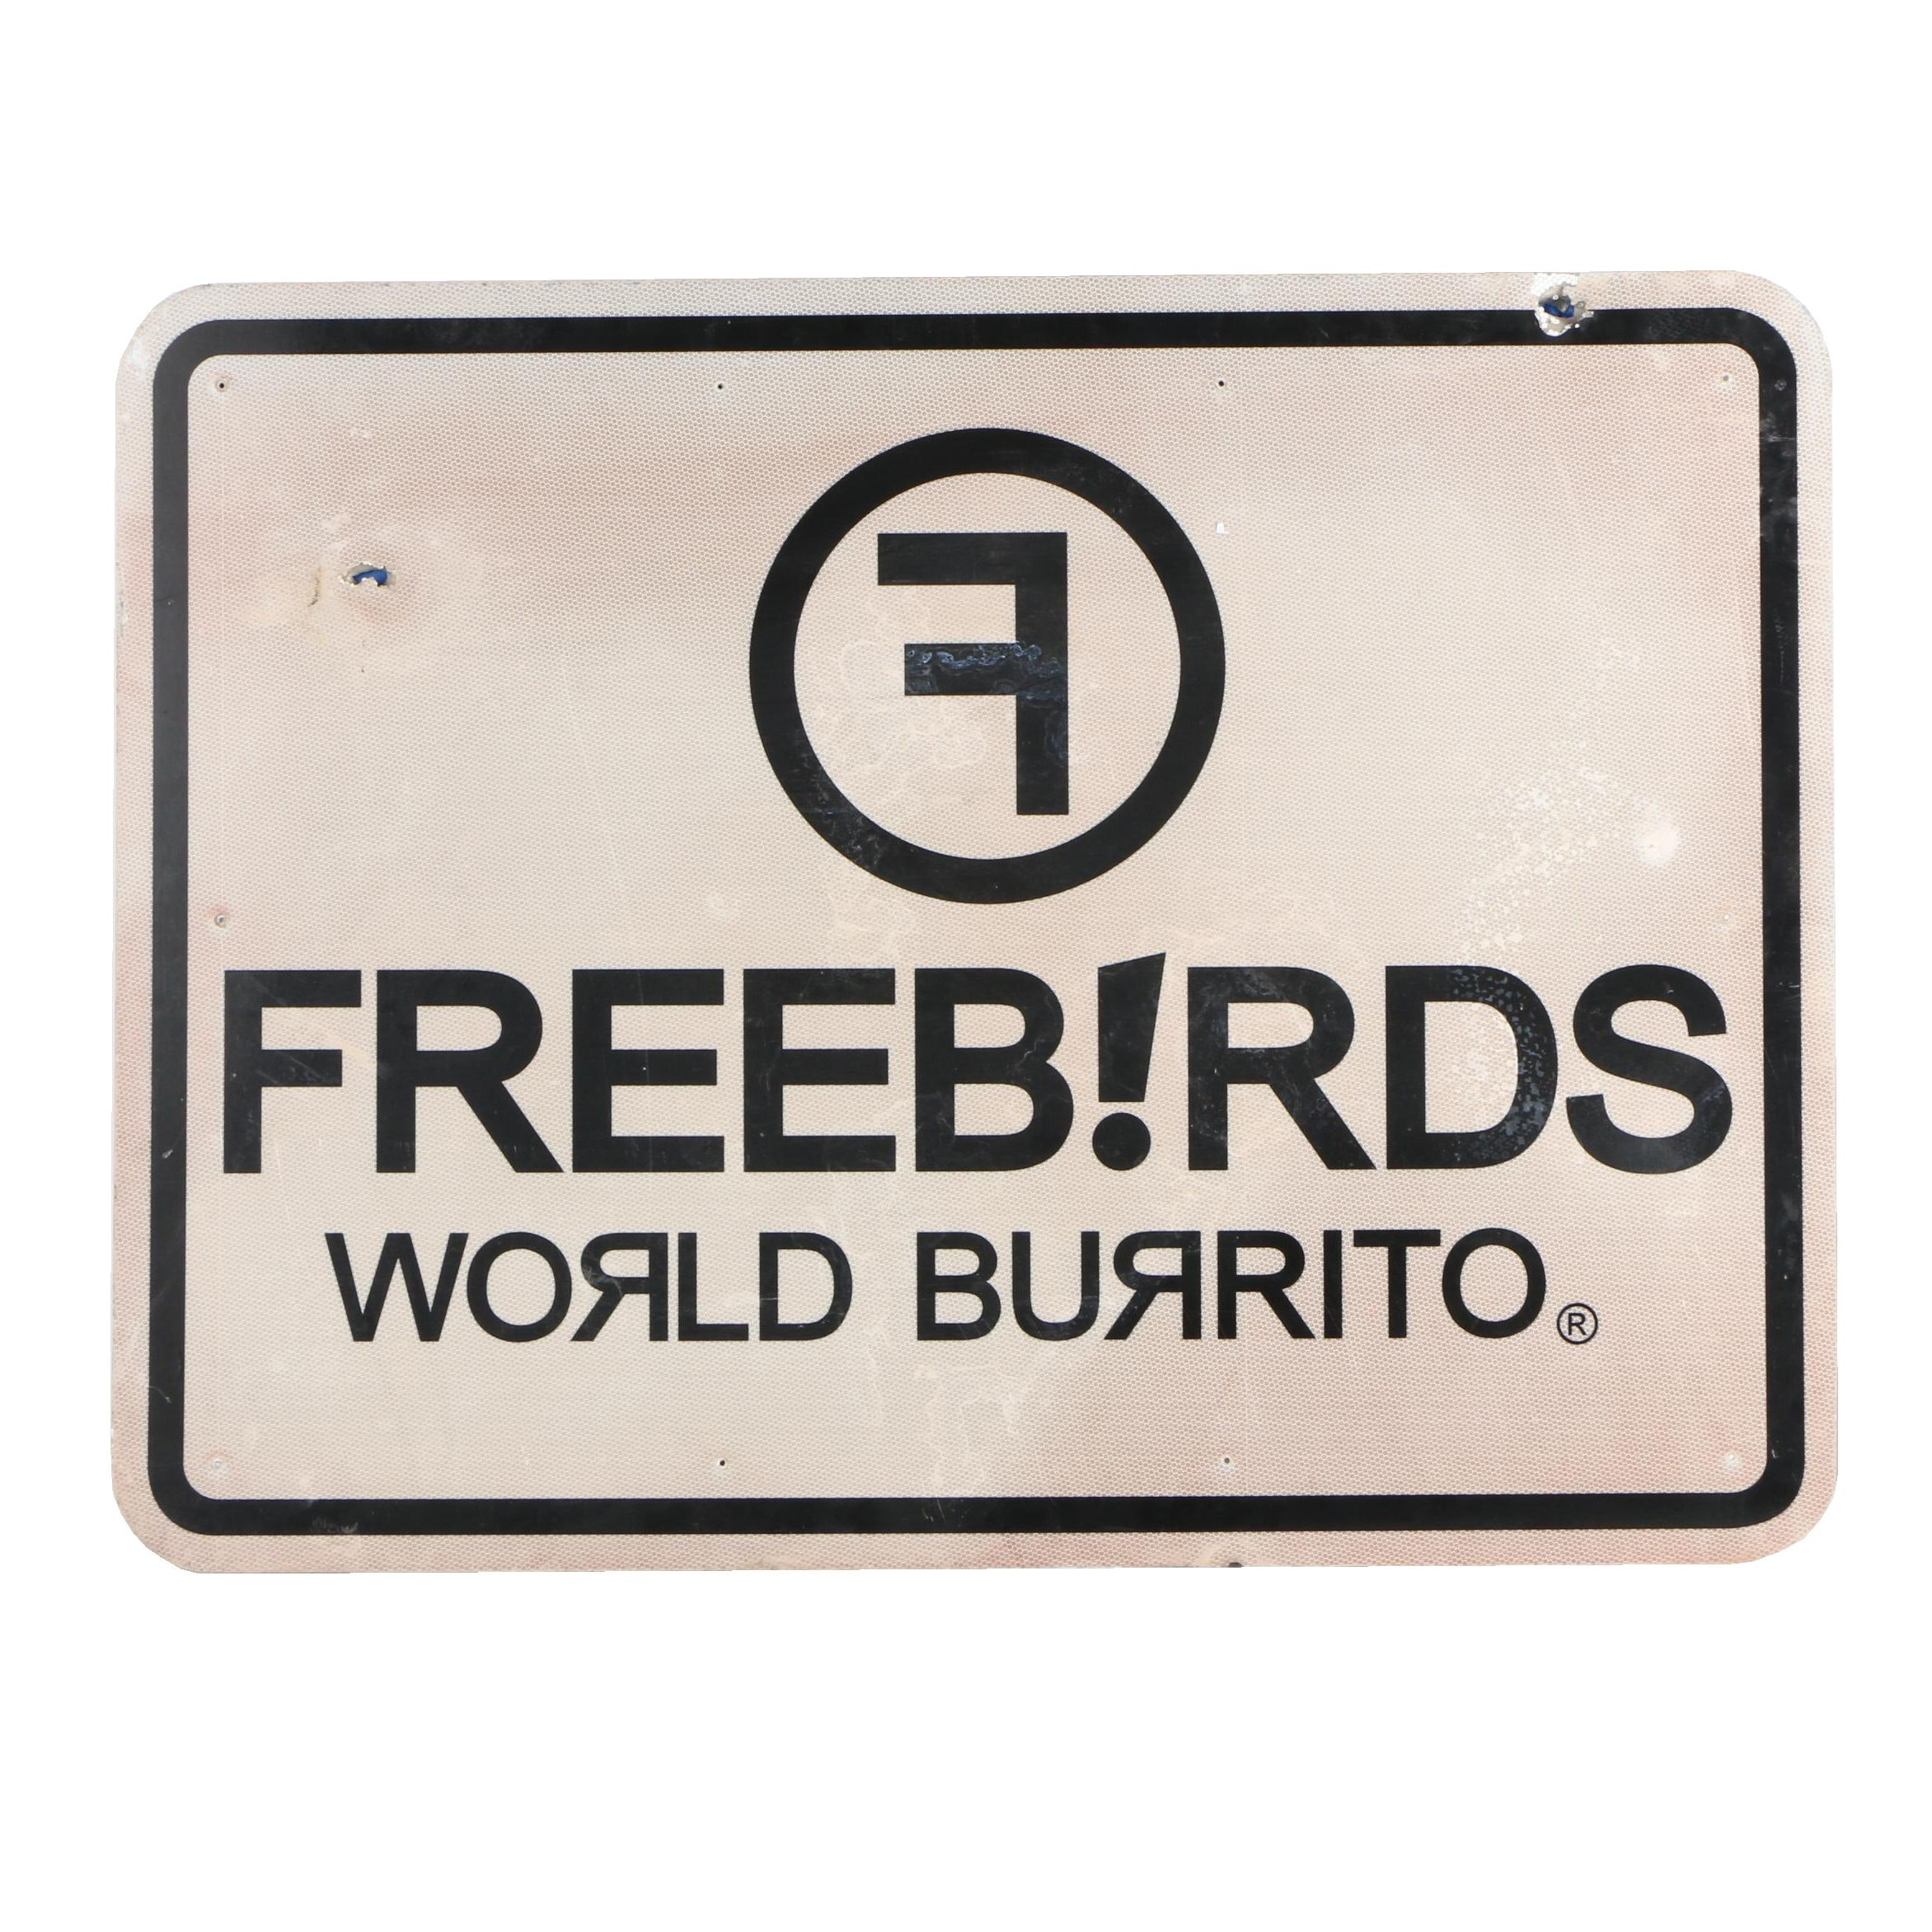 Freeb!rds World Burrito Metal Reflective Road Sign